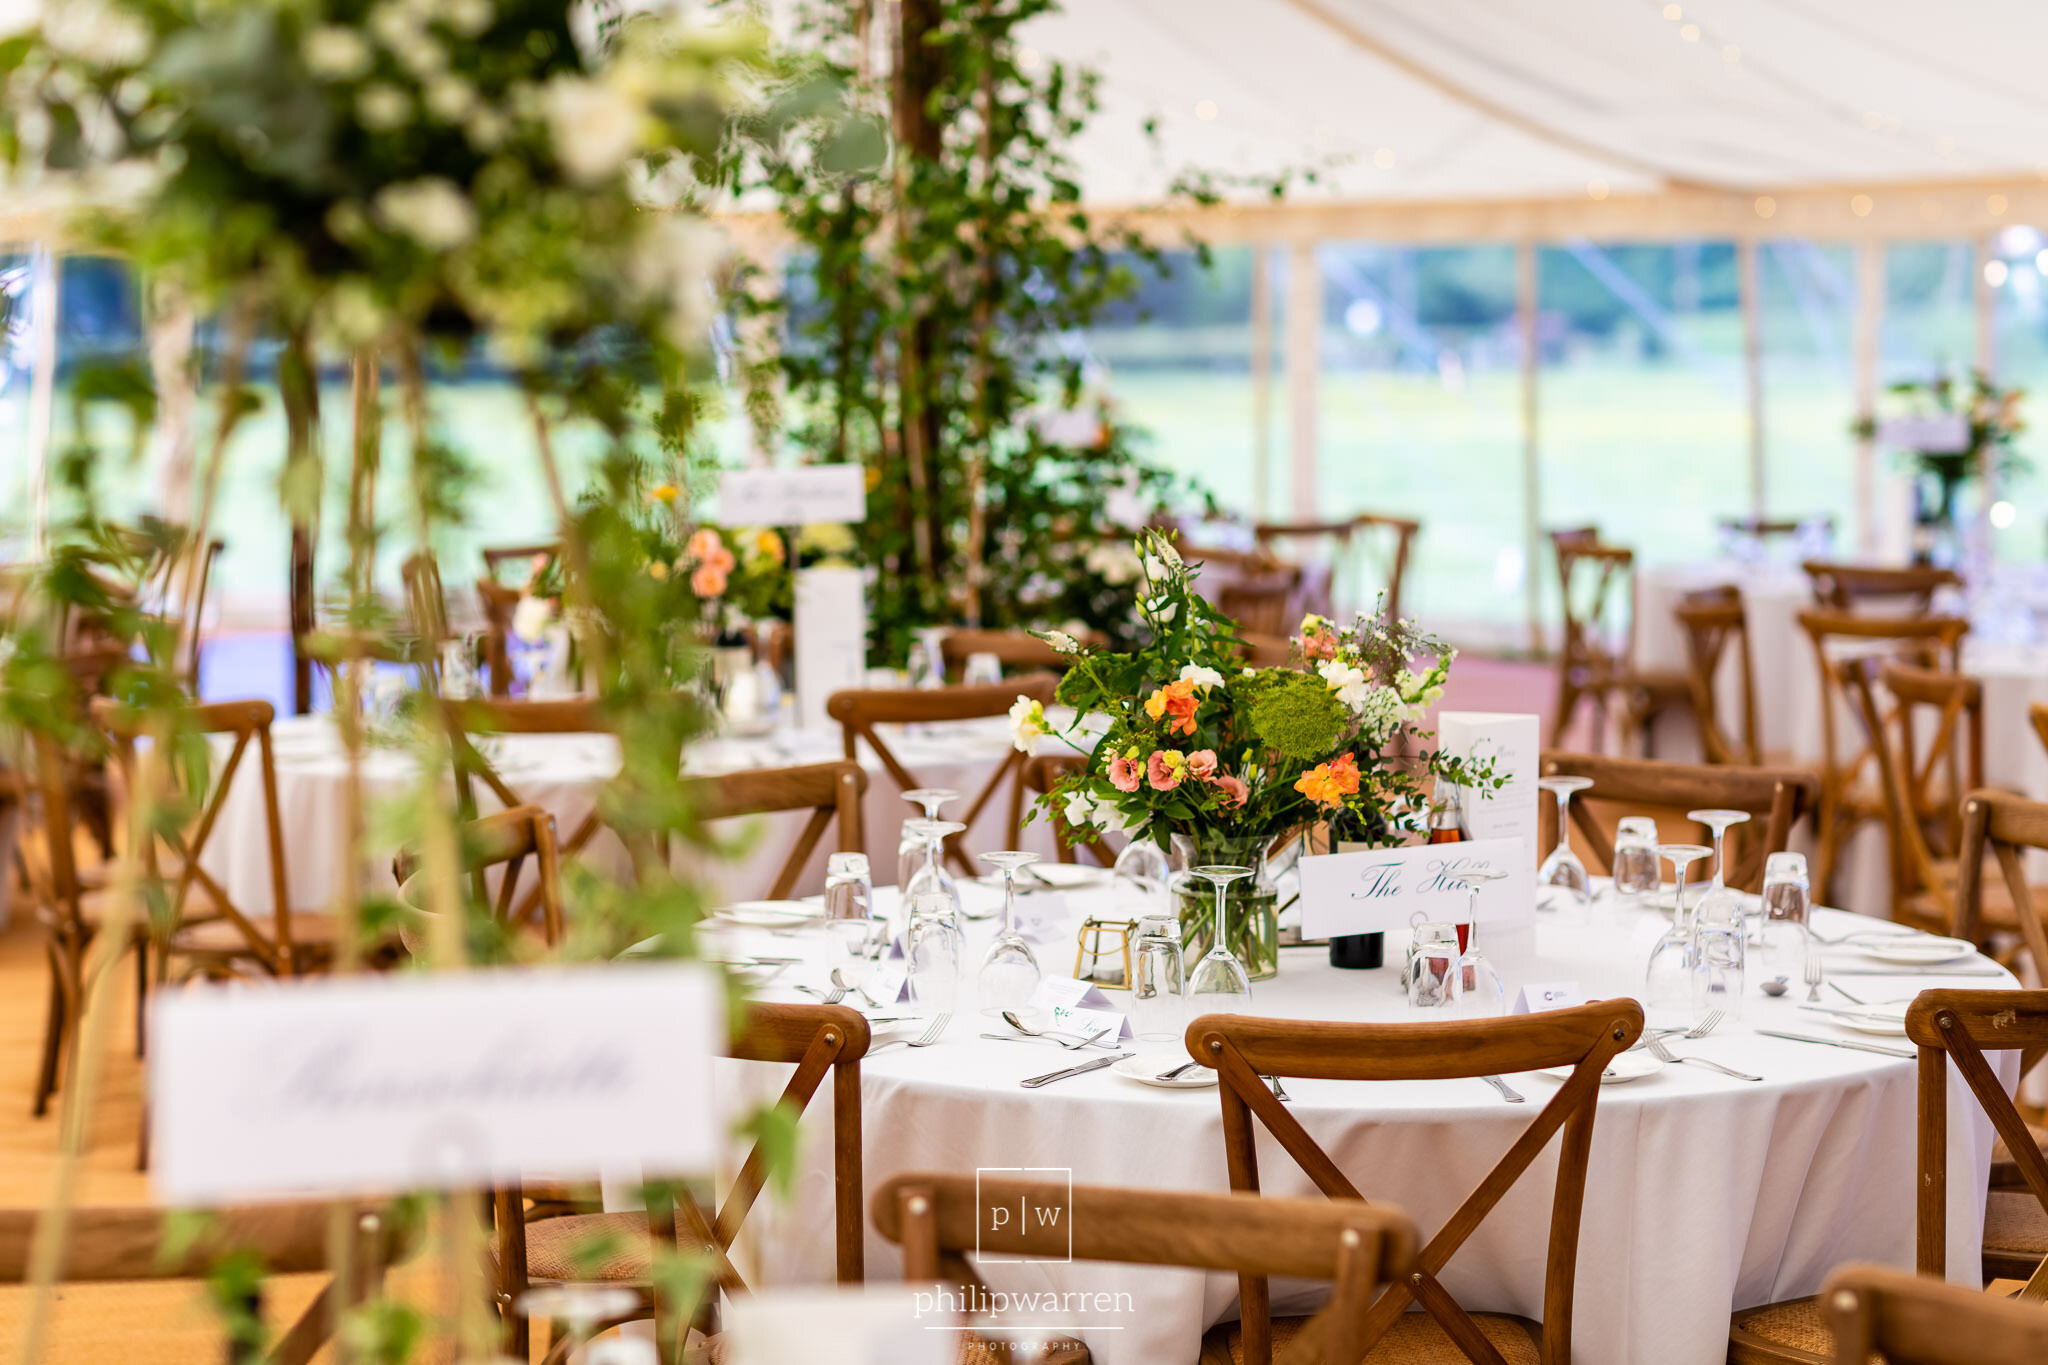 Countryside Marquee Wedding - 1.jpg